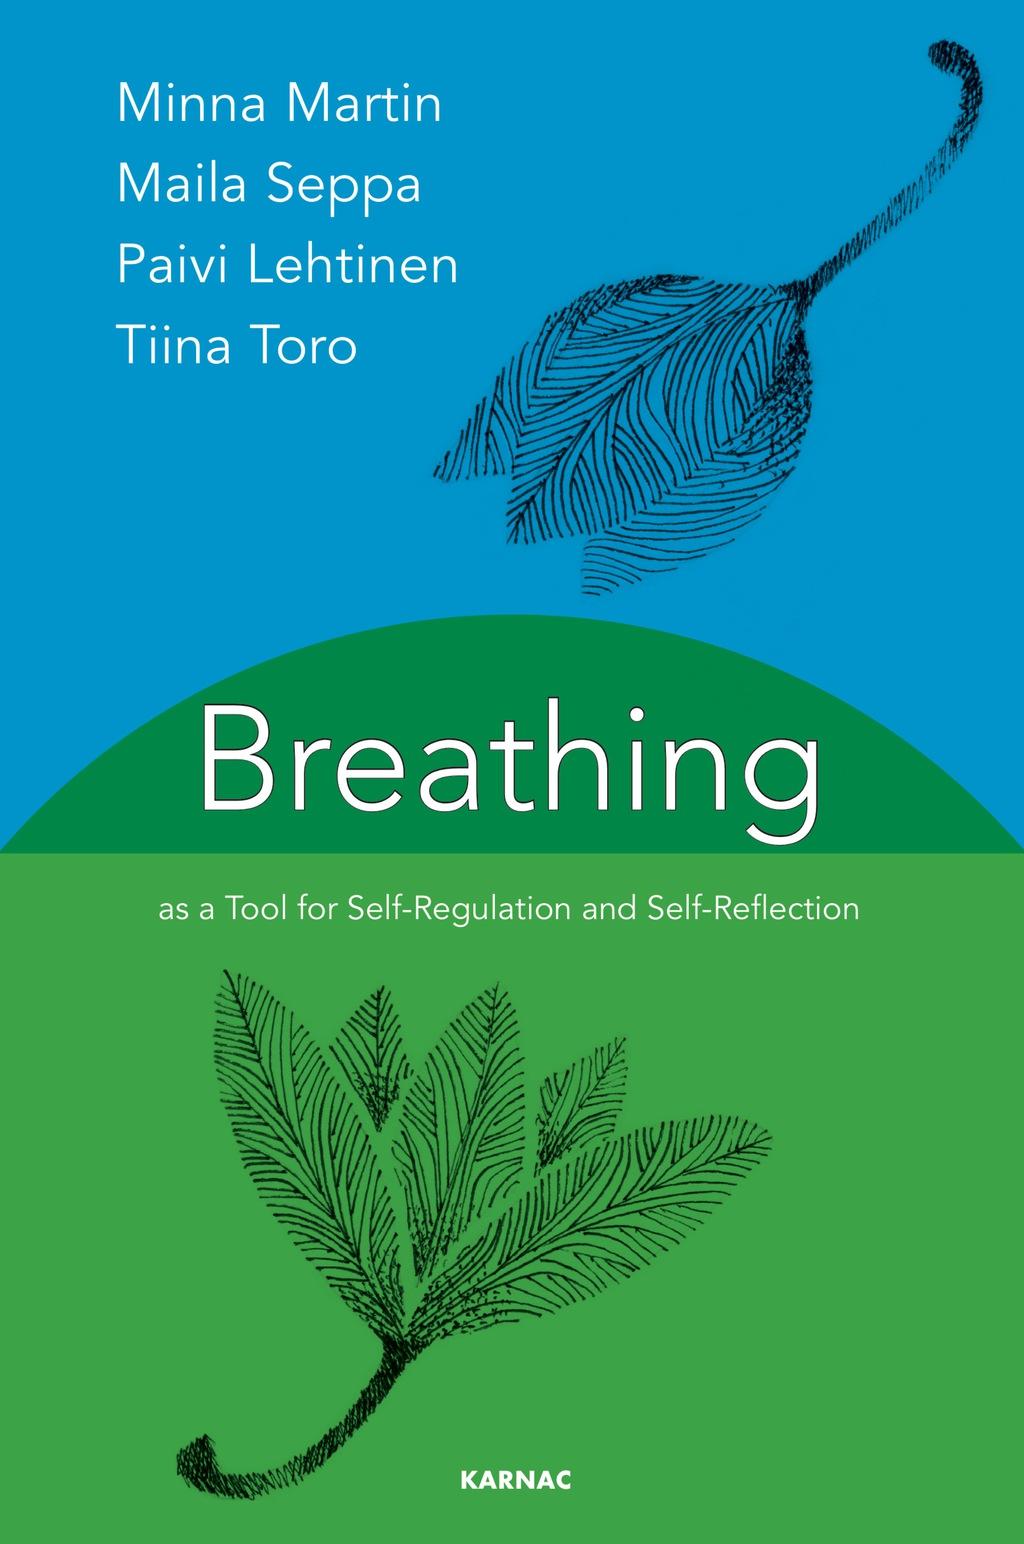 By Lehtinen,  Paivi; Martin,  Minna; Seppa,  Maila; Toro,  Tina PRINTISBN: 9781782203834 E-TEXT ISBN: 9781782414896 Edition: 0